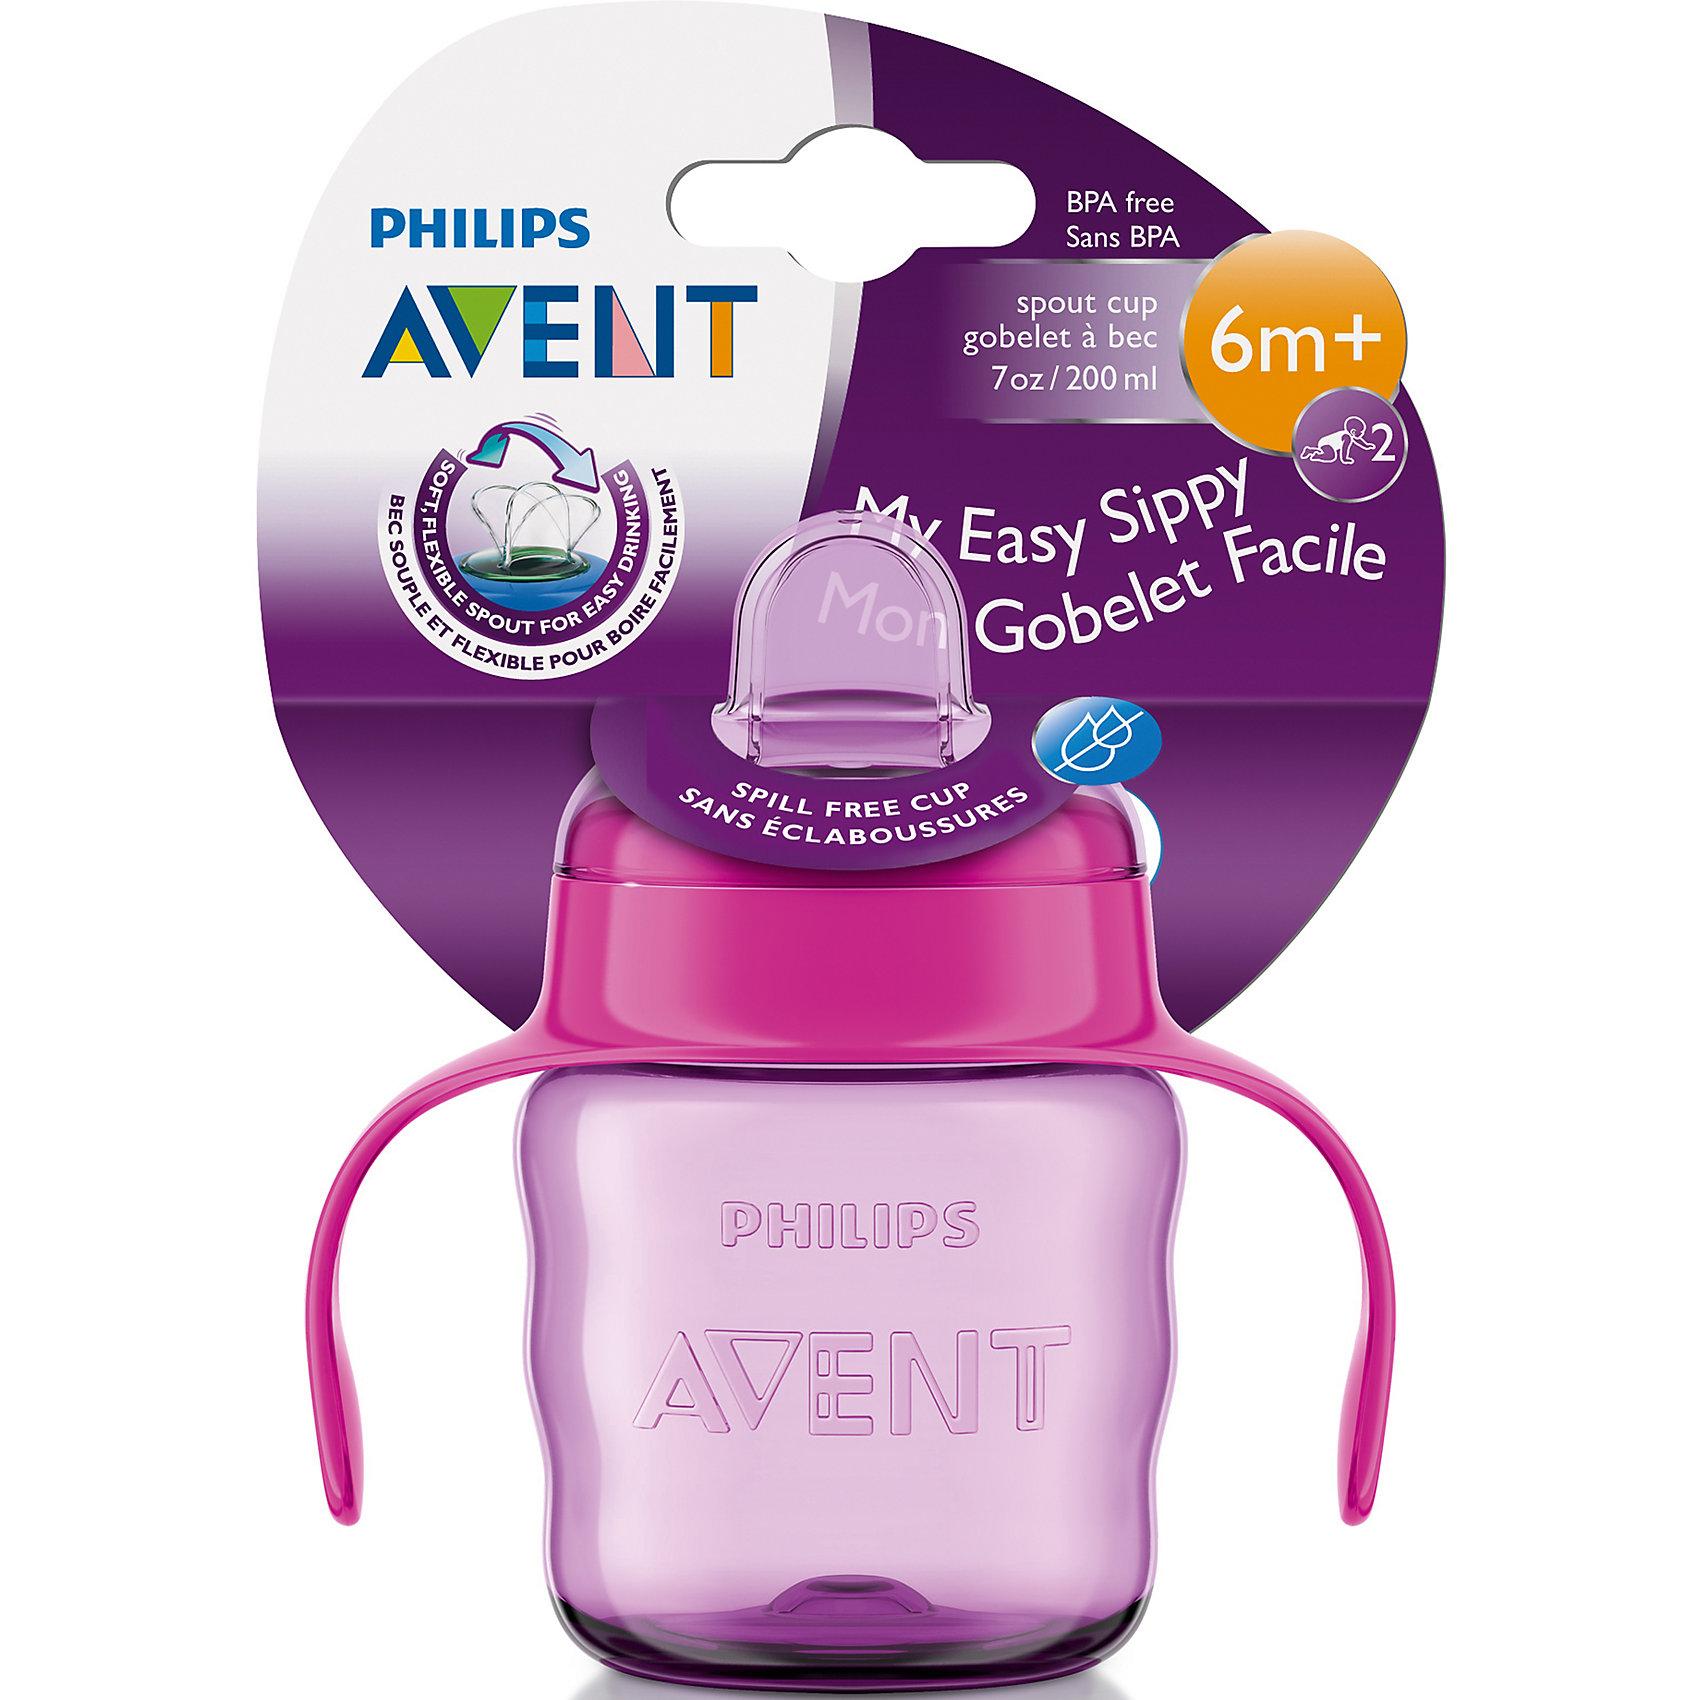 PHILIPS AVENT Чашка-поильник с носиком Comfort, 200 мл, Avent, сиреневый/розовый